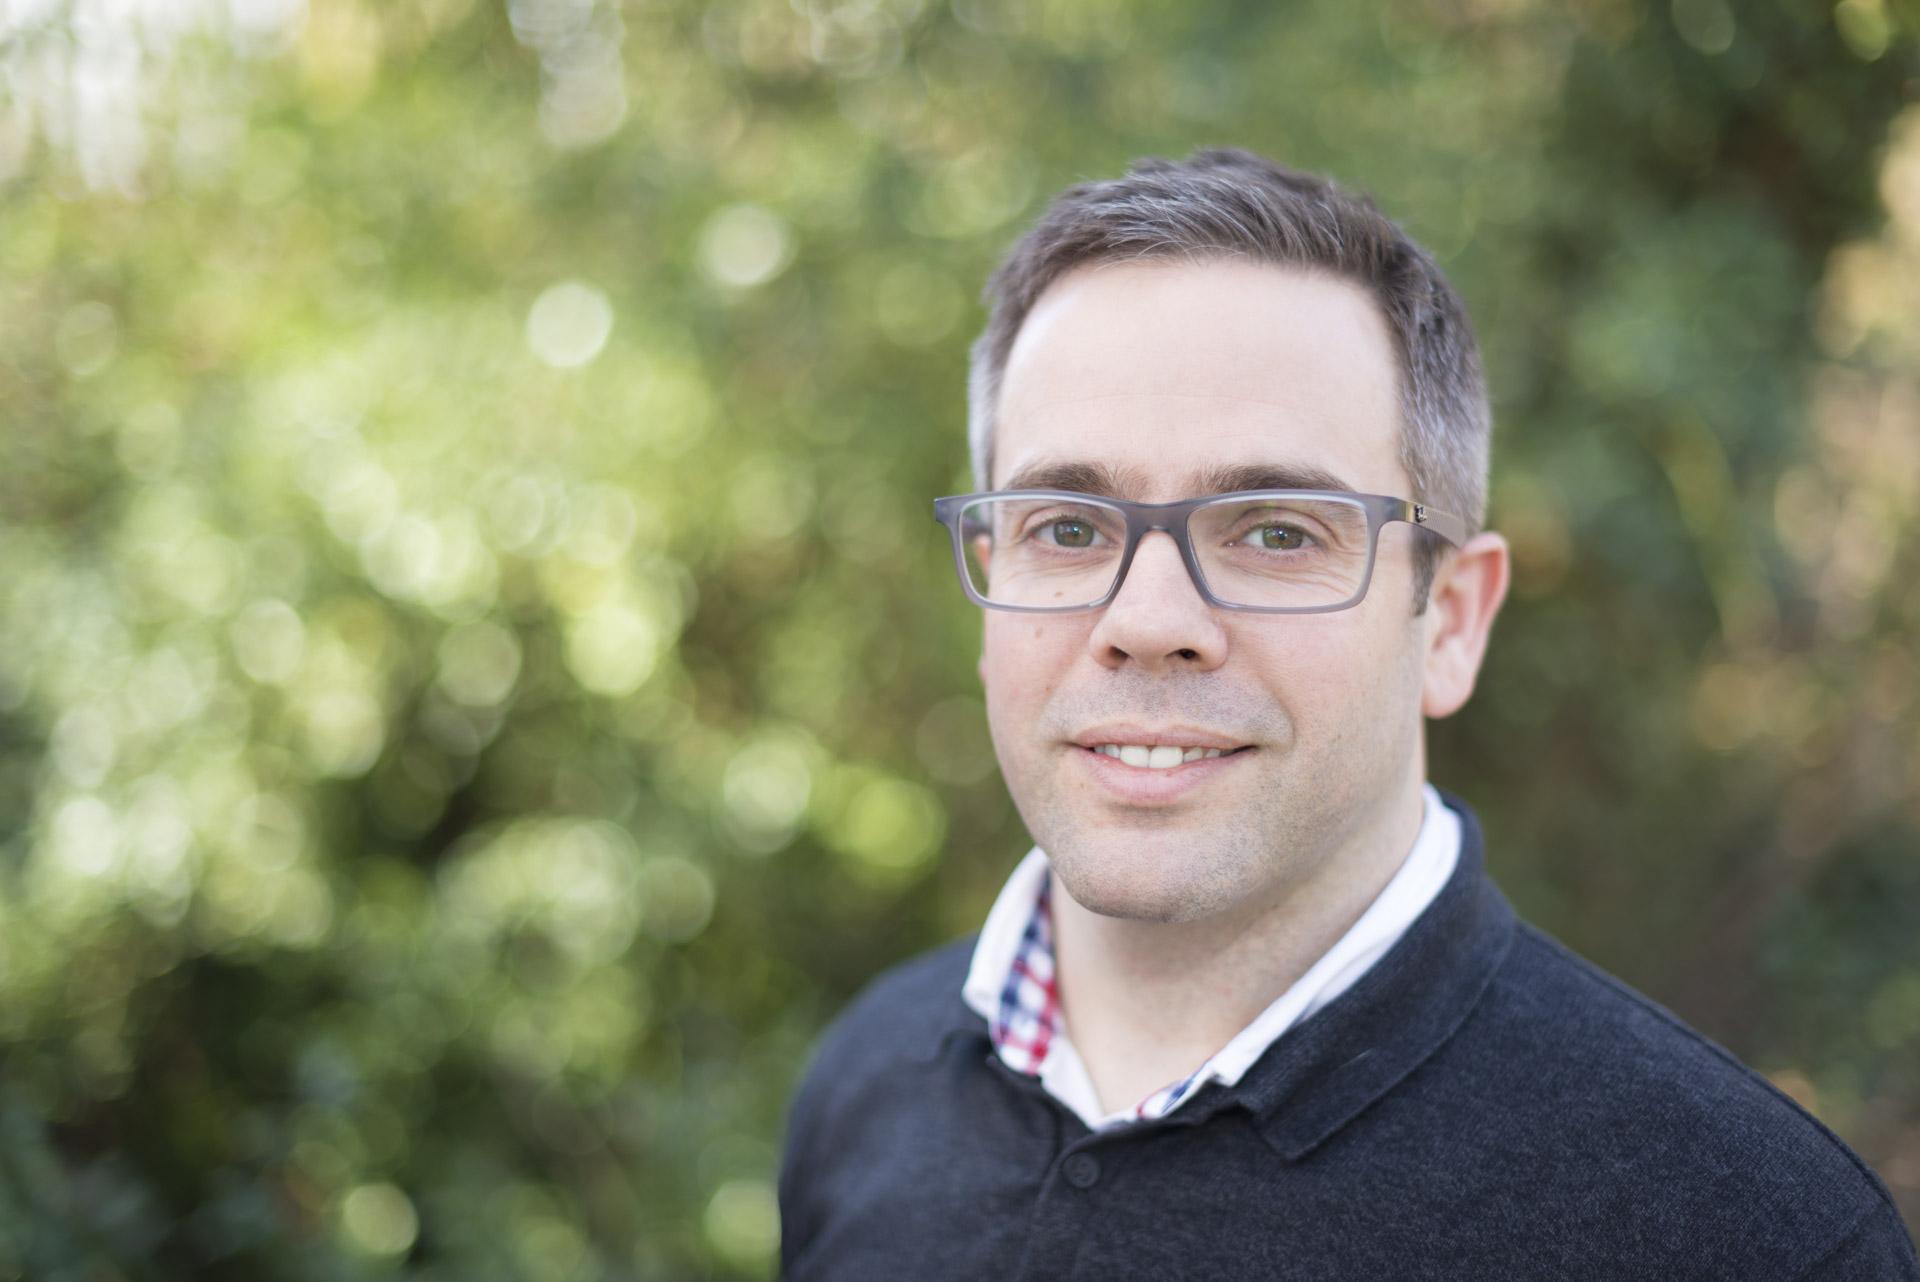 Pete Wharton, Peter Wharton of Wharton Natural Infrastructure Consultants, ecologist, arborist, warwickshire, midlands, alcester